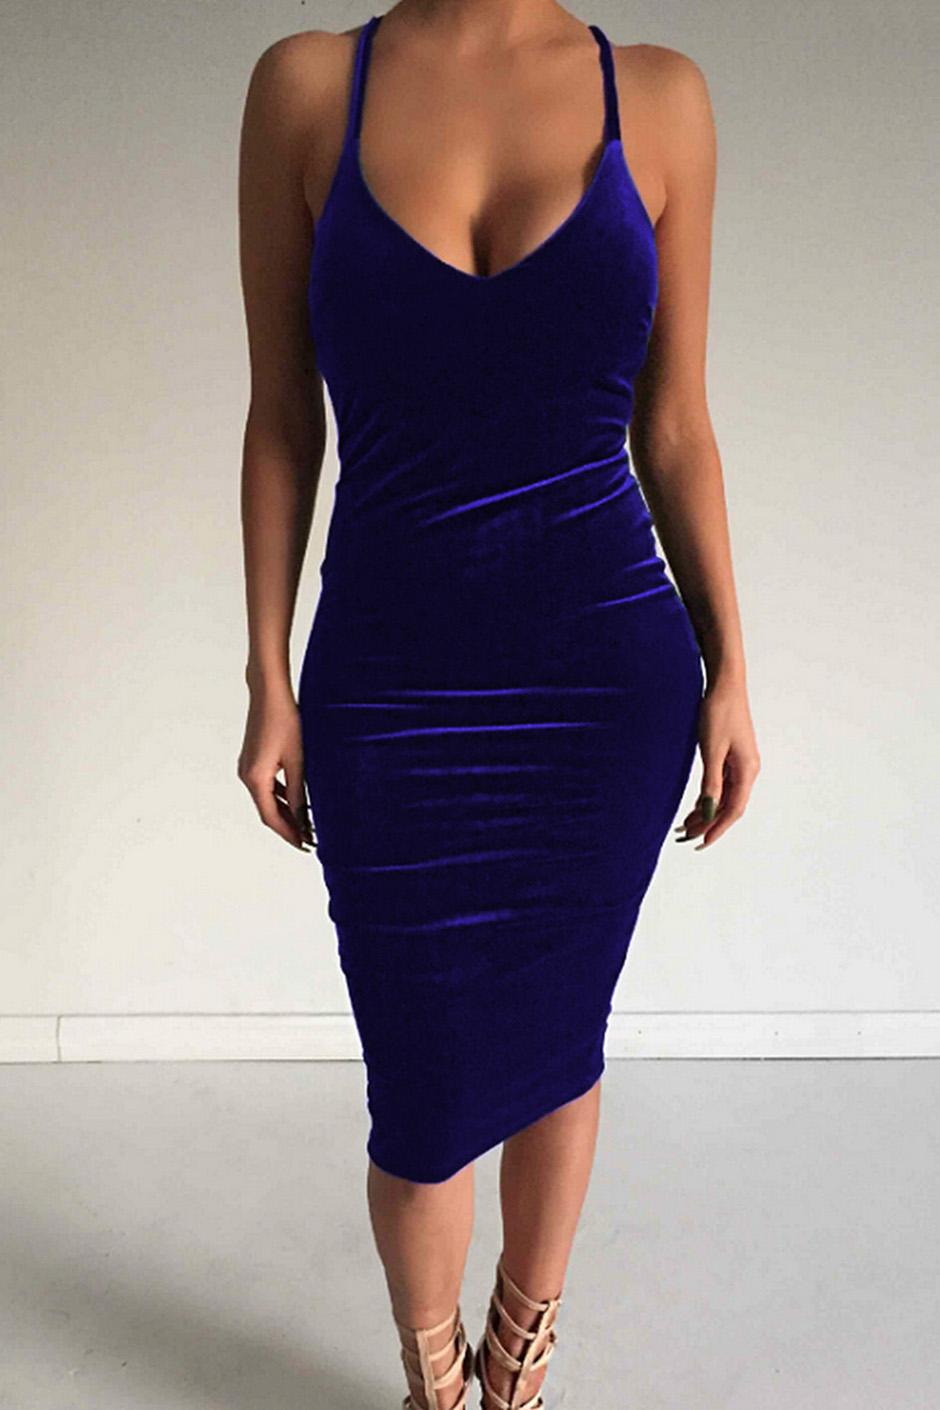 Women's Sleeveless Bodycon Midi Dress Velvet Club Bandage Dress, Royal blue